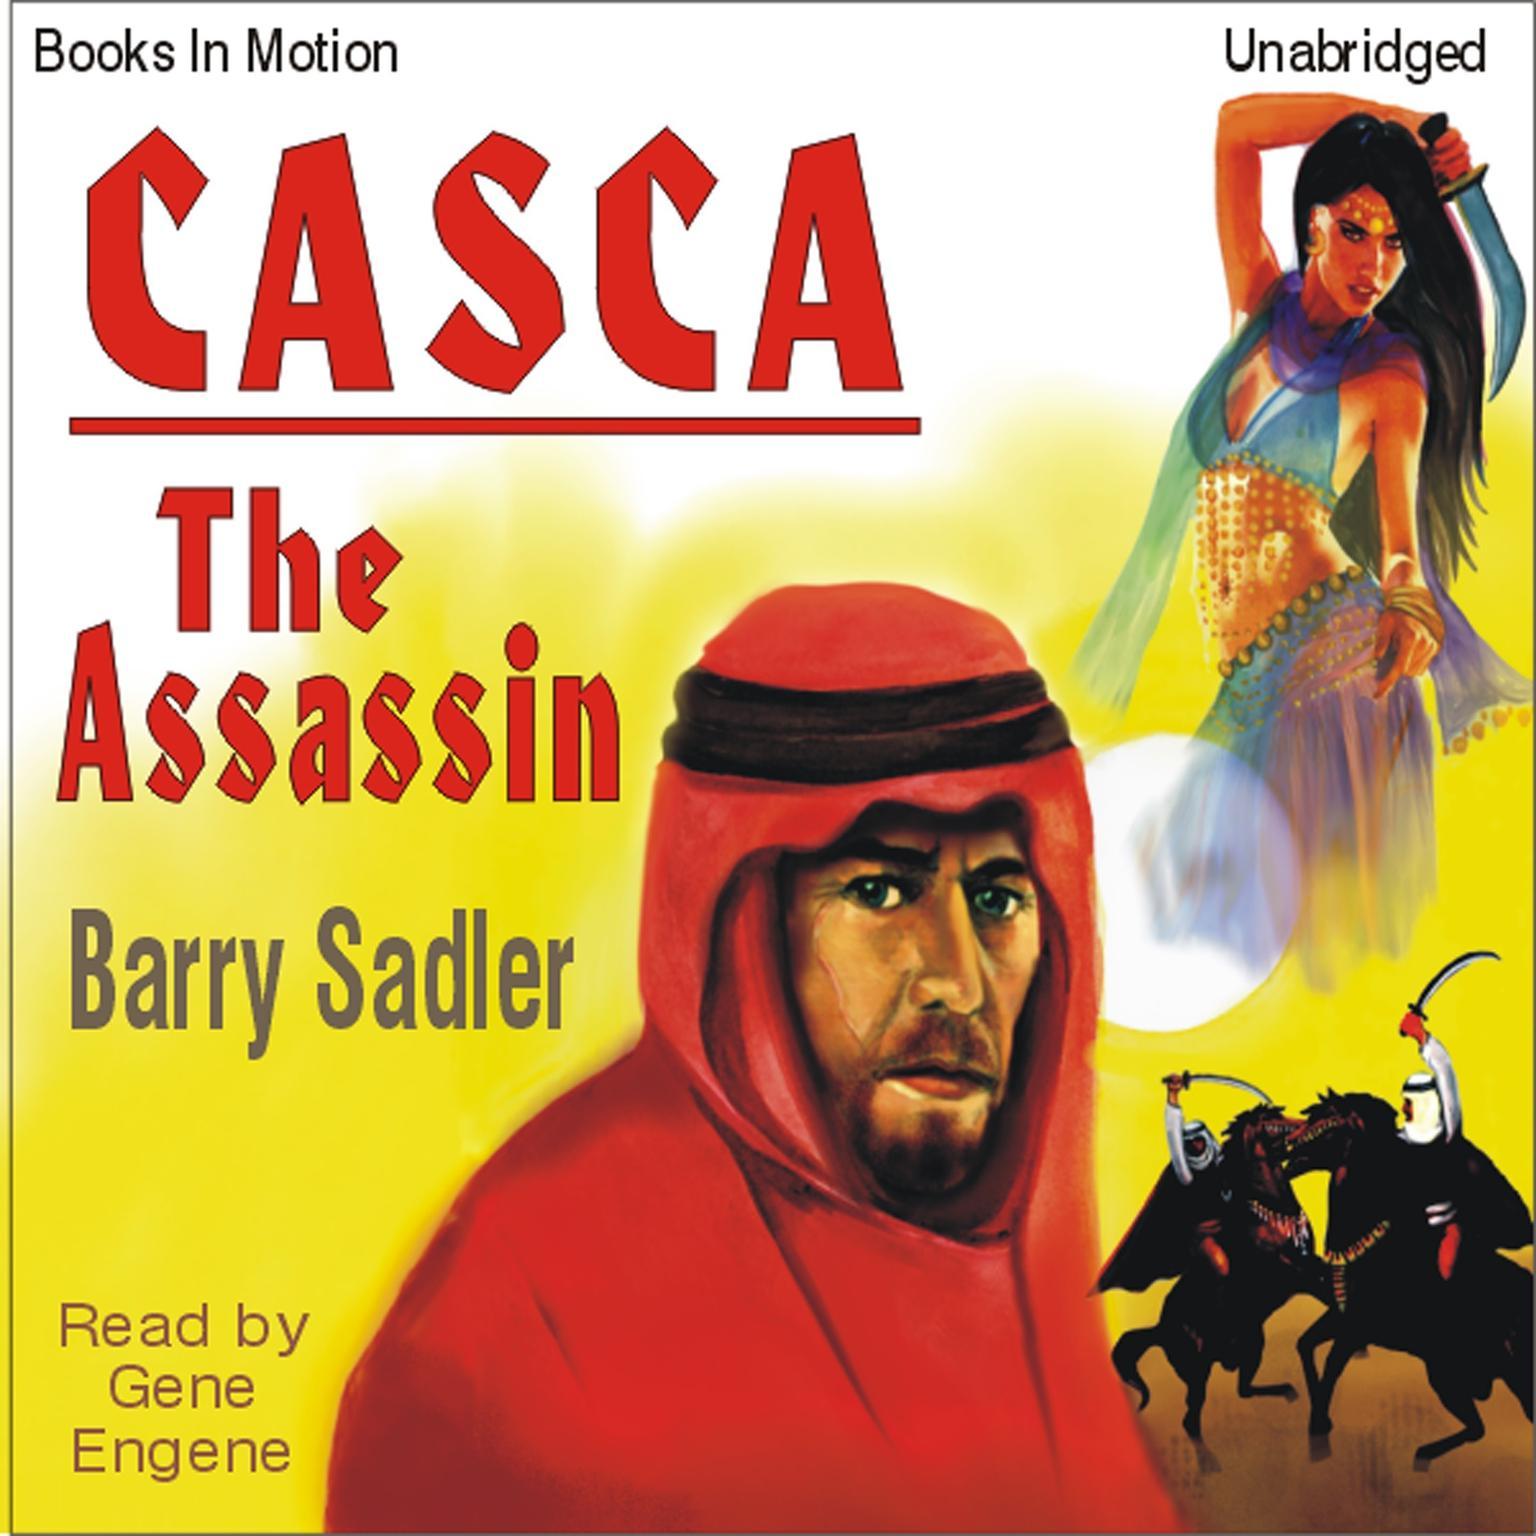 Casca- The Assassin Audiobook, by Barry Sadler